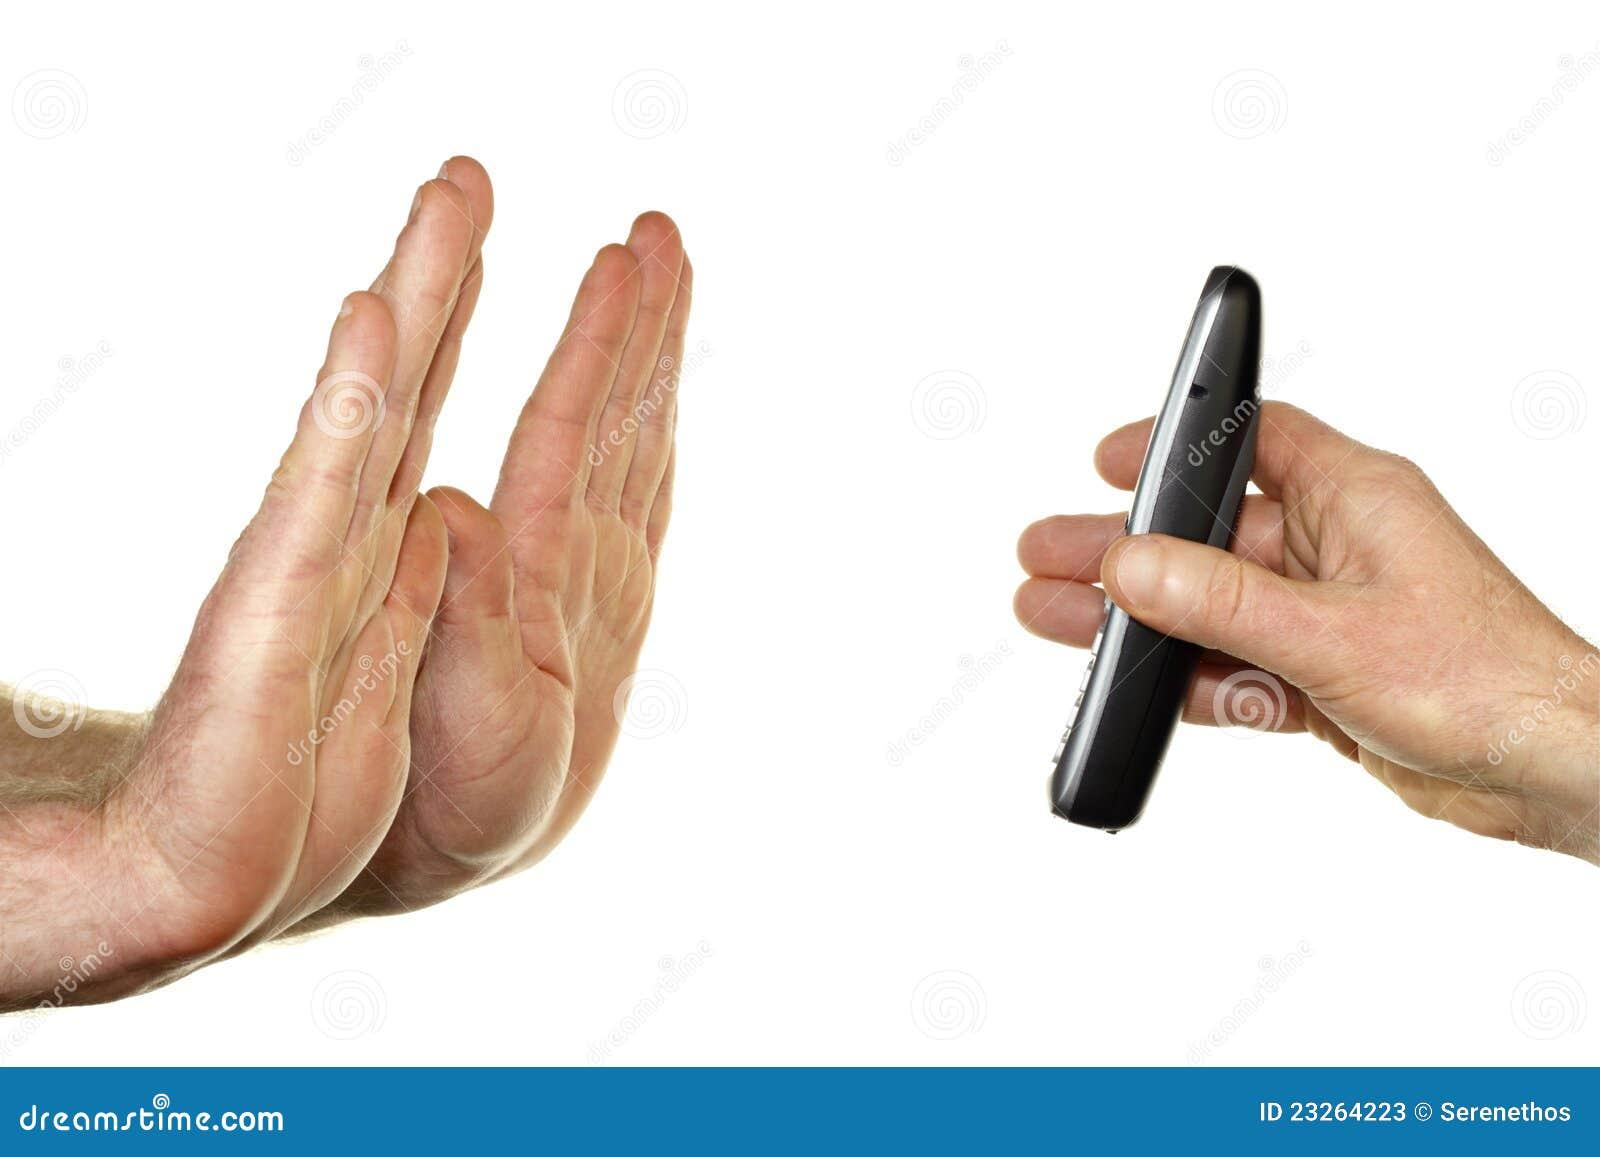 Do Not Call Gesture